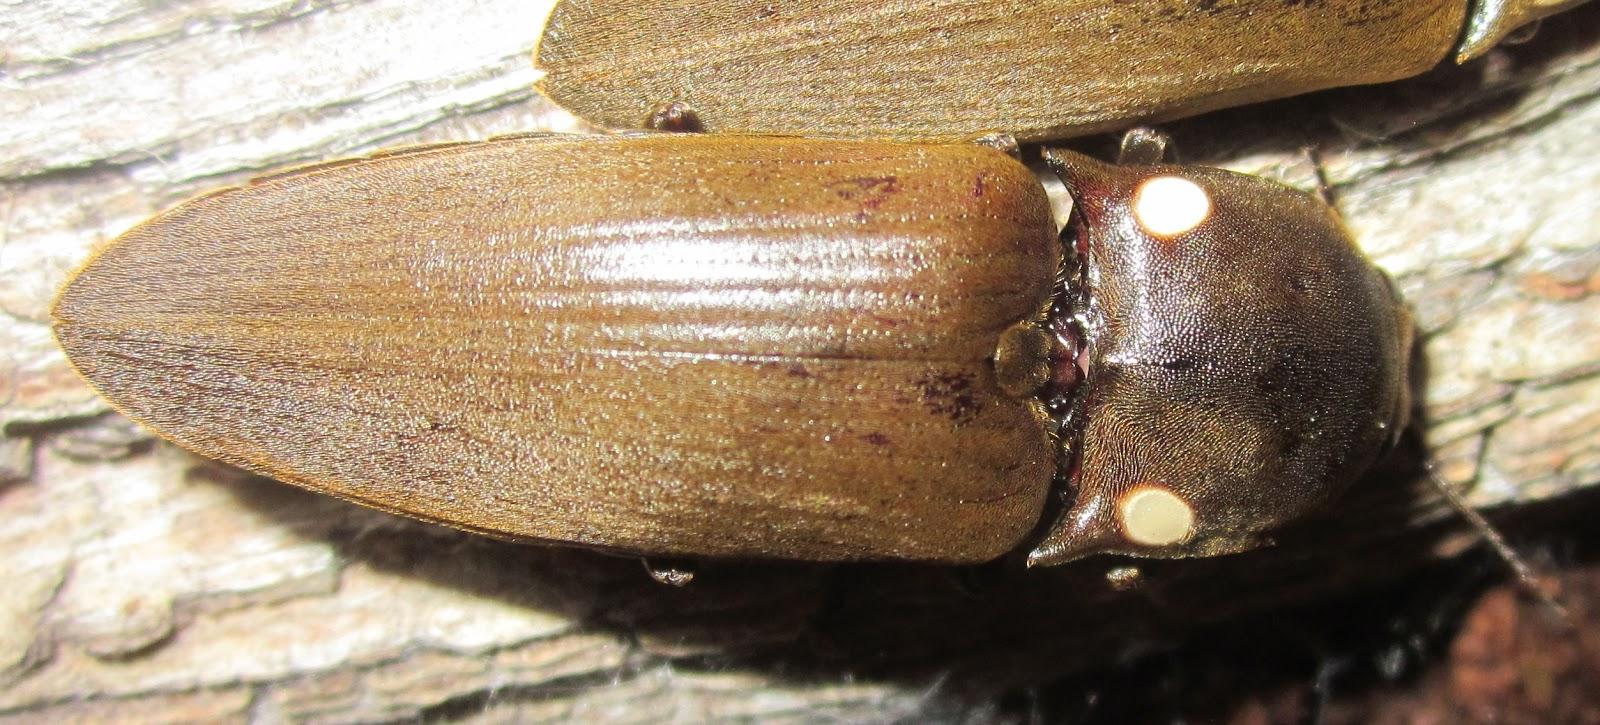 Pyrophorus2020%252315.JPG